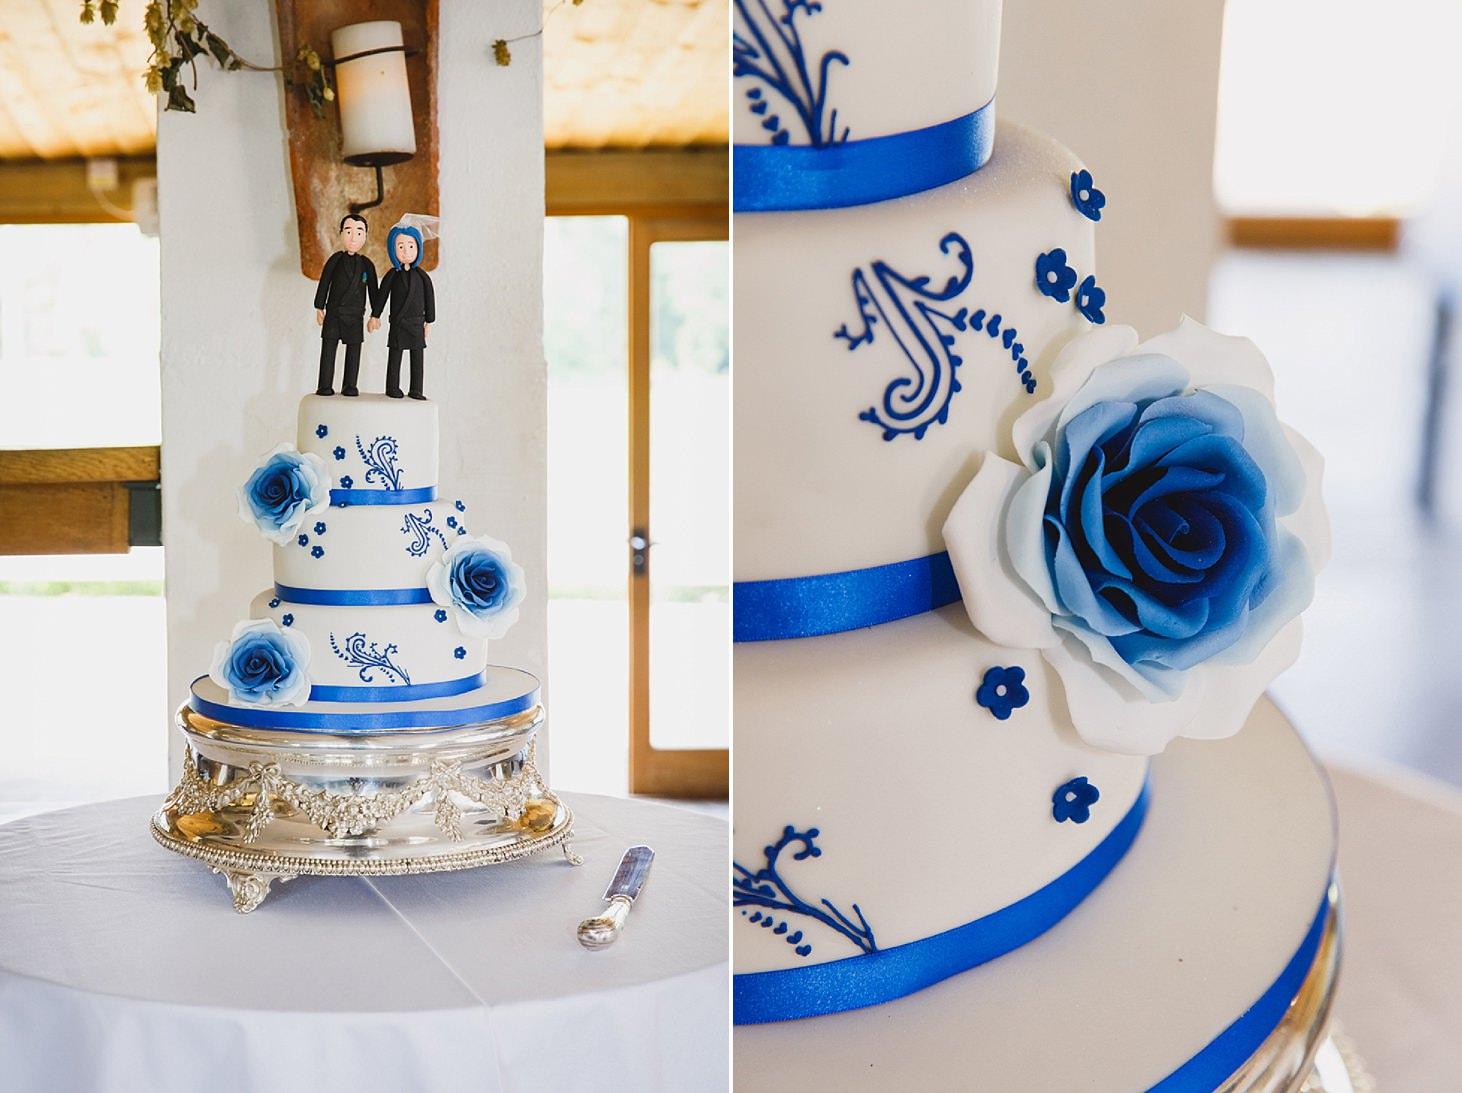 gate street barn wedding photography wedding cake with ninjas on top at gate street barn wedding